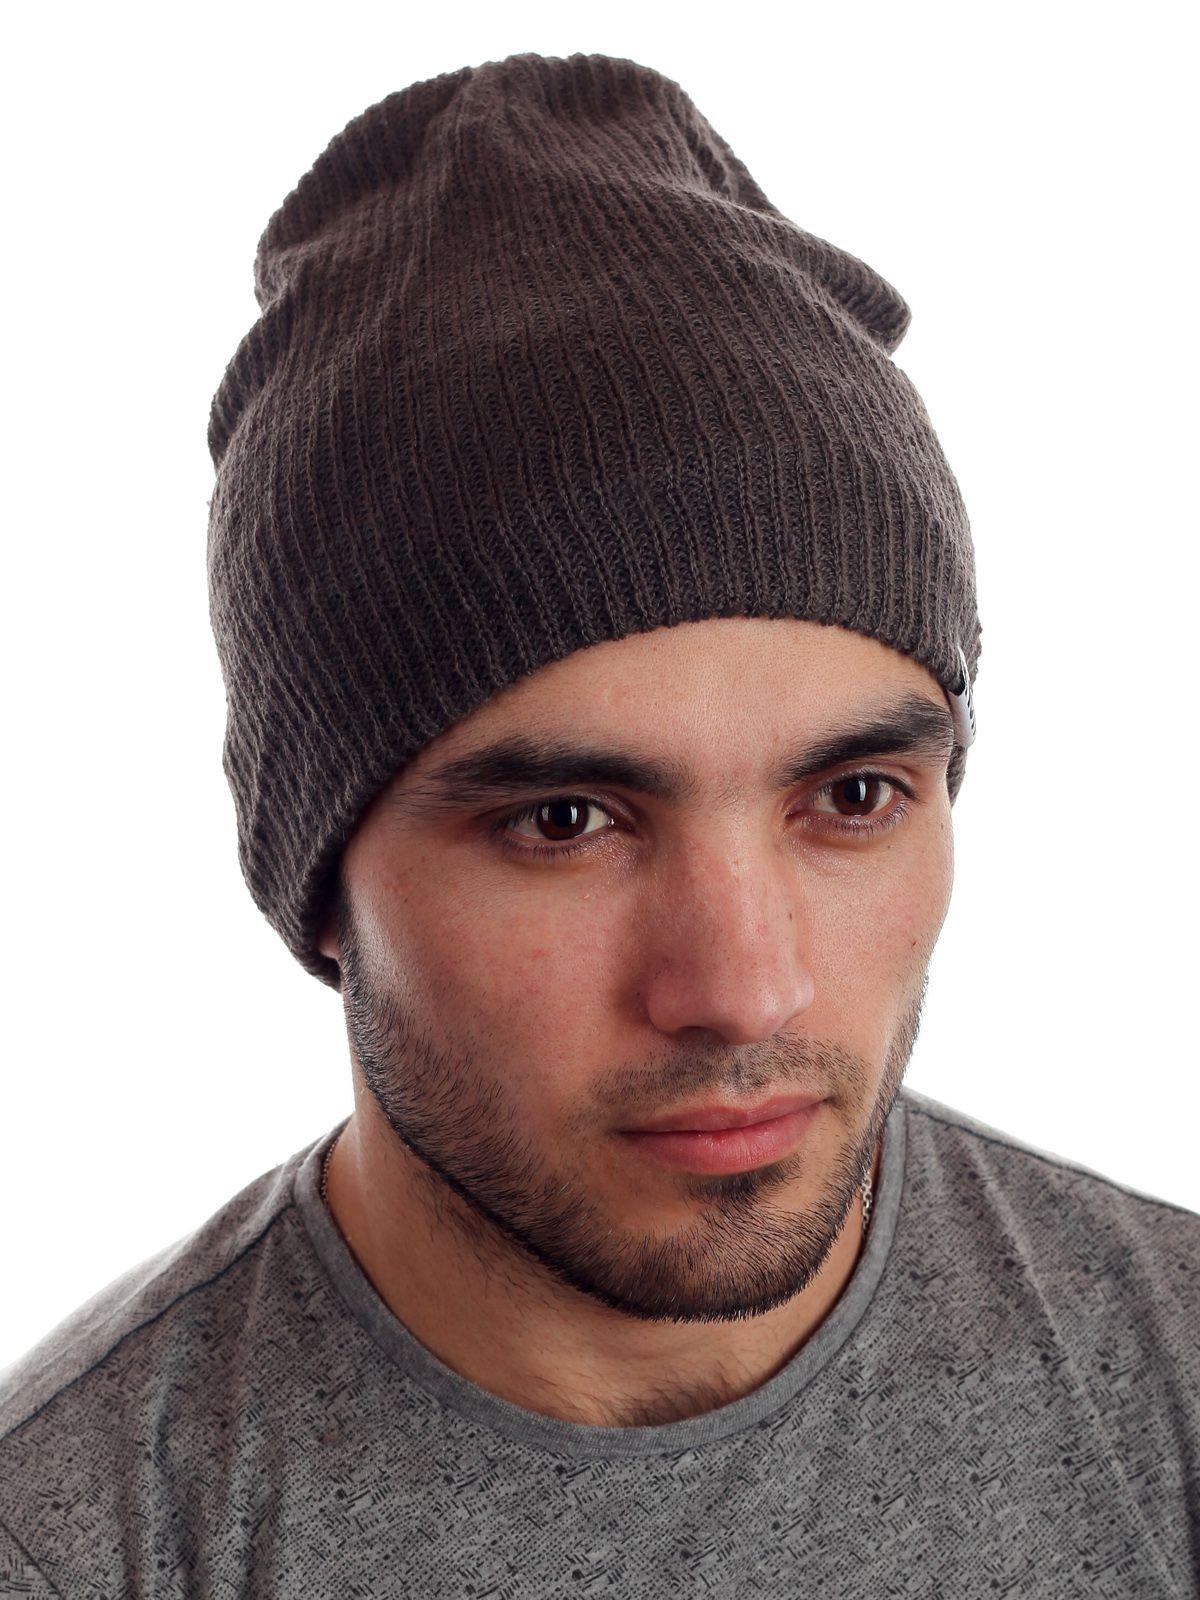 Мужская шапка в спортивном стиле от Neff